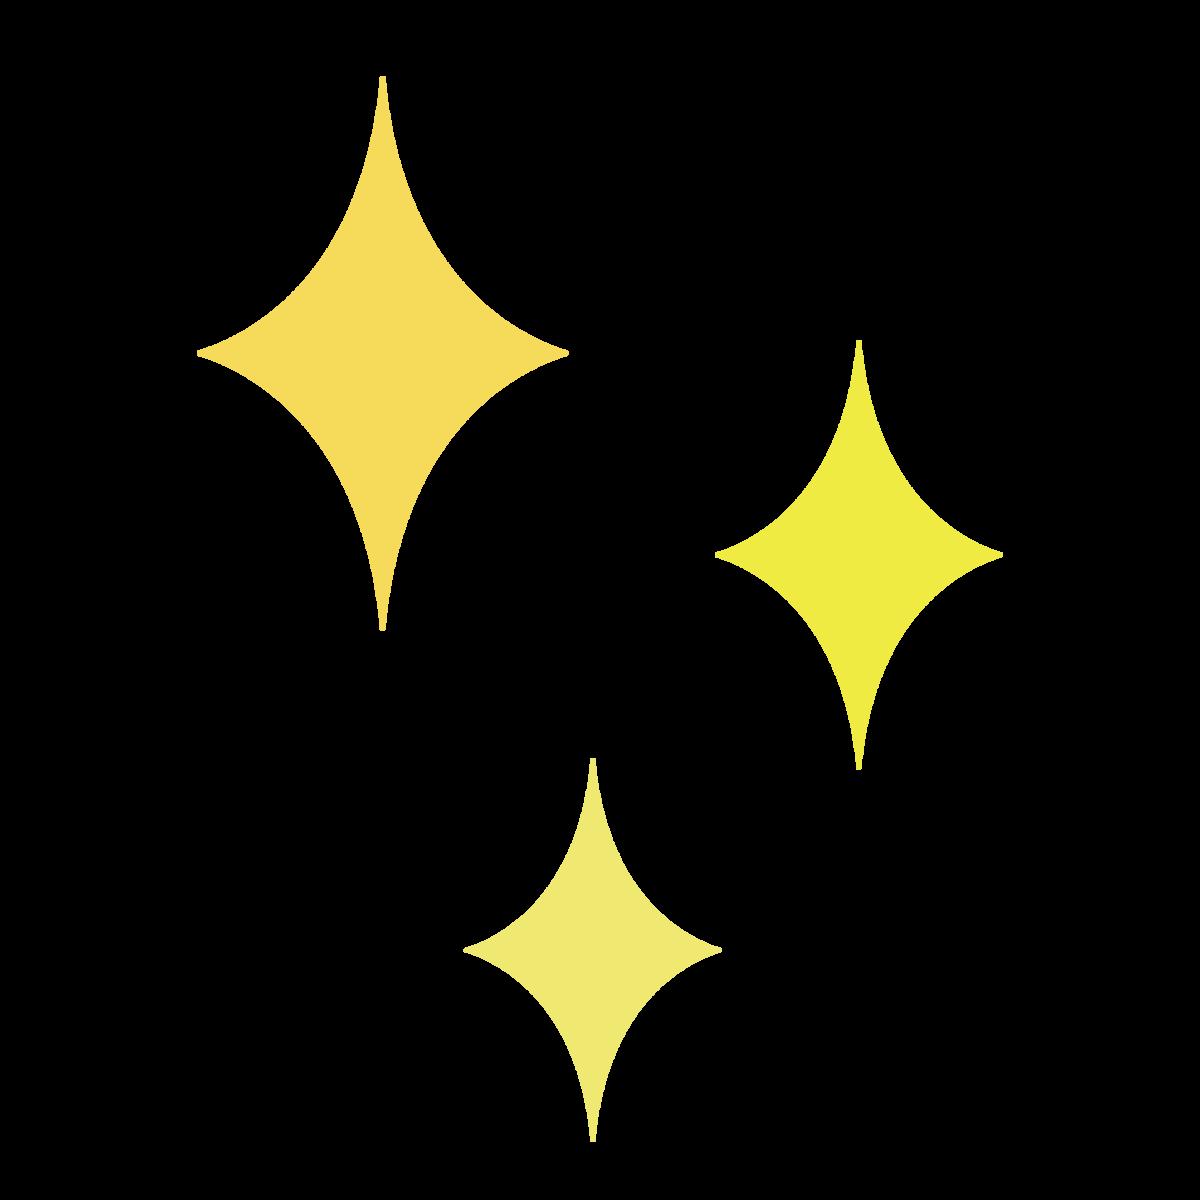 f:id:shinocha:20200402143250p:plain